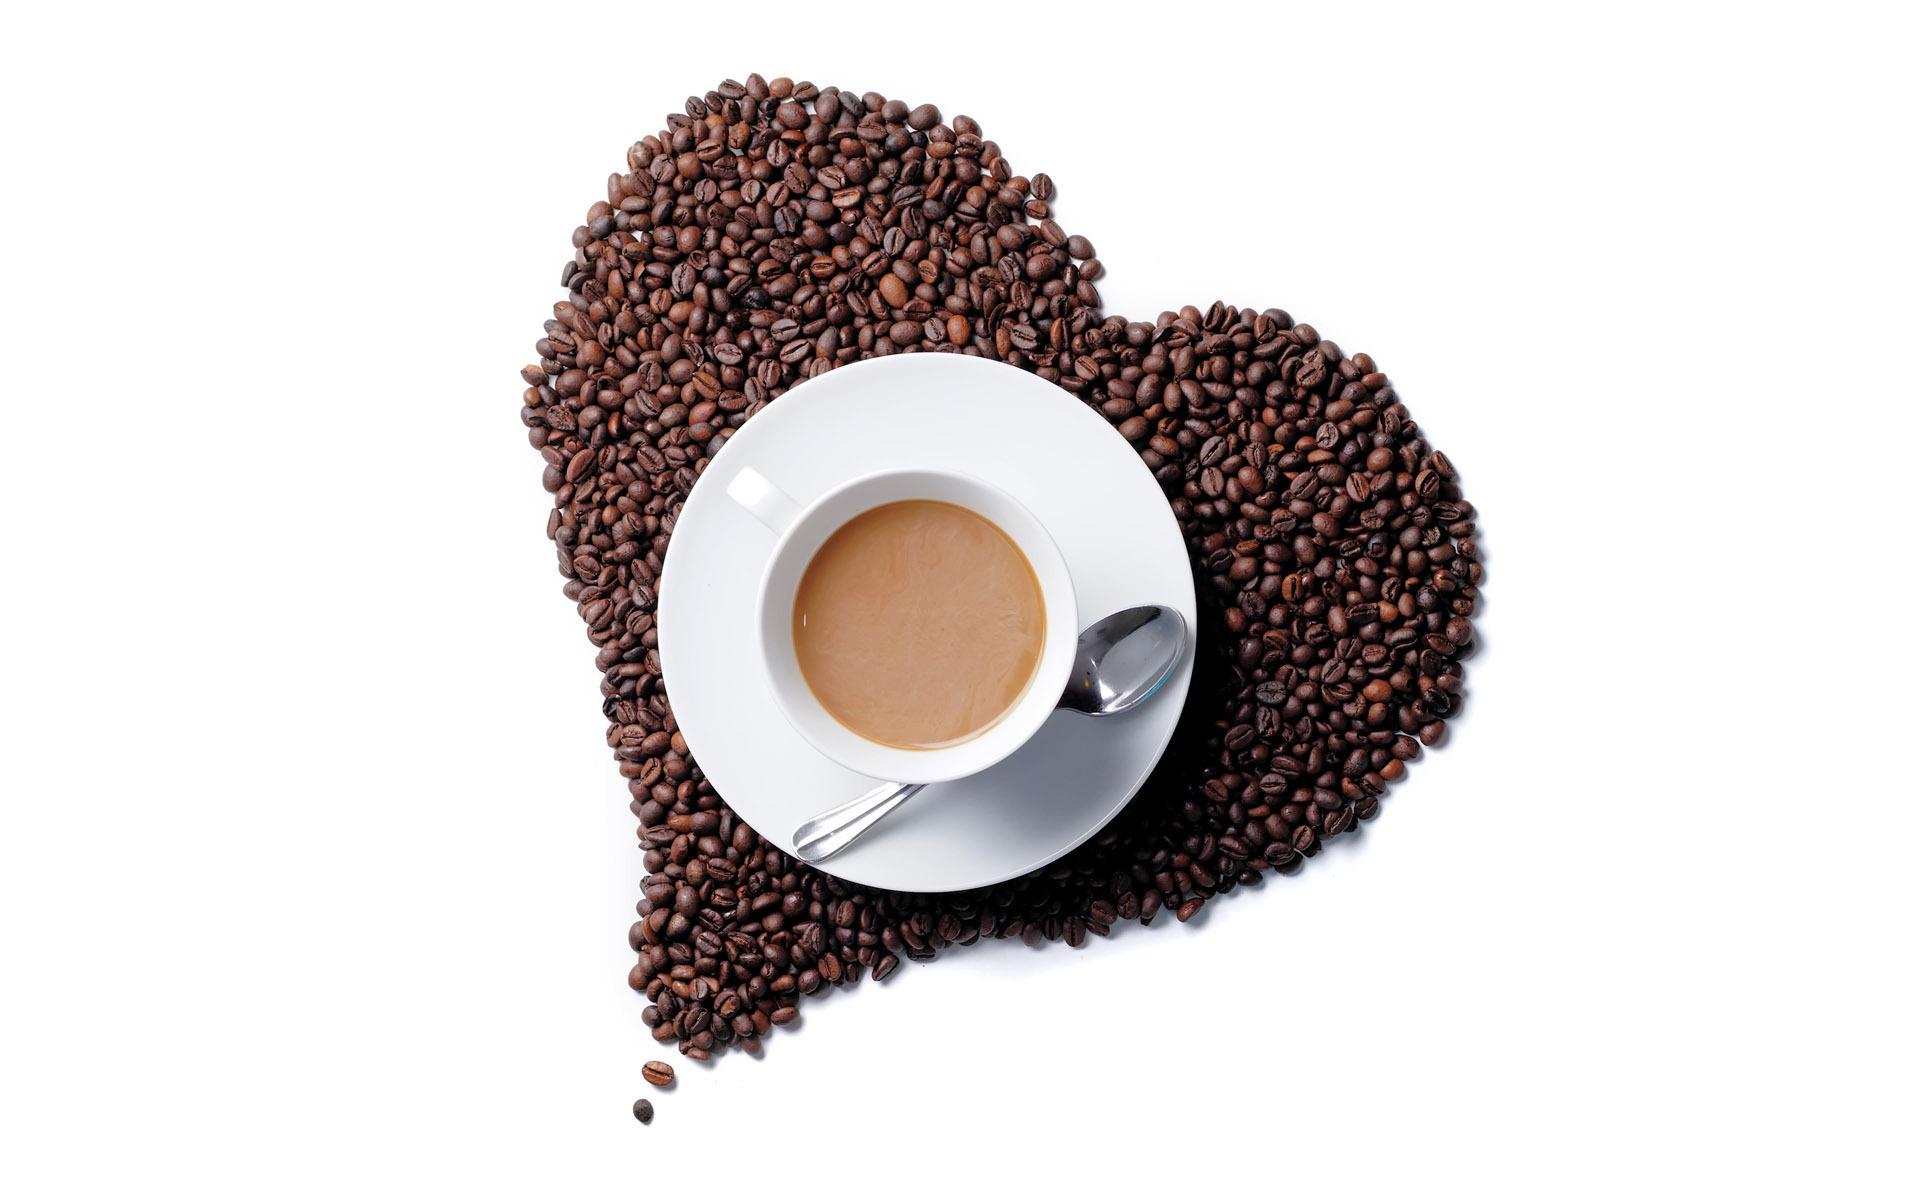 Hintergrundbilder : Lebensmittel, Herz, Kaffee, Getränk, braun ...